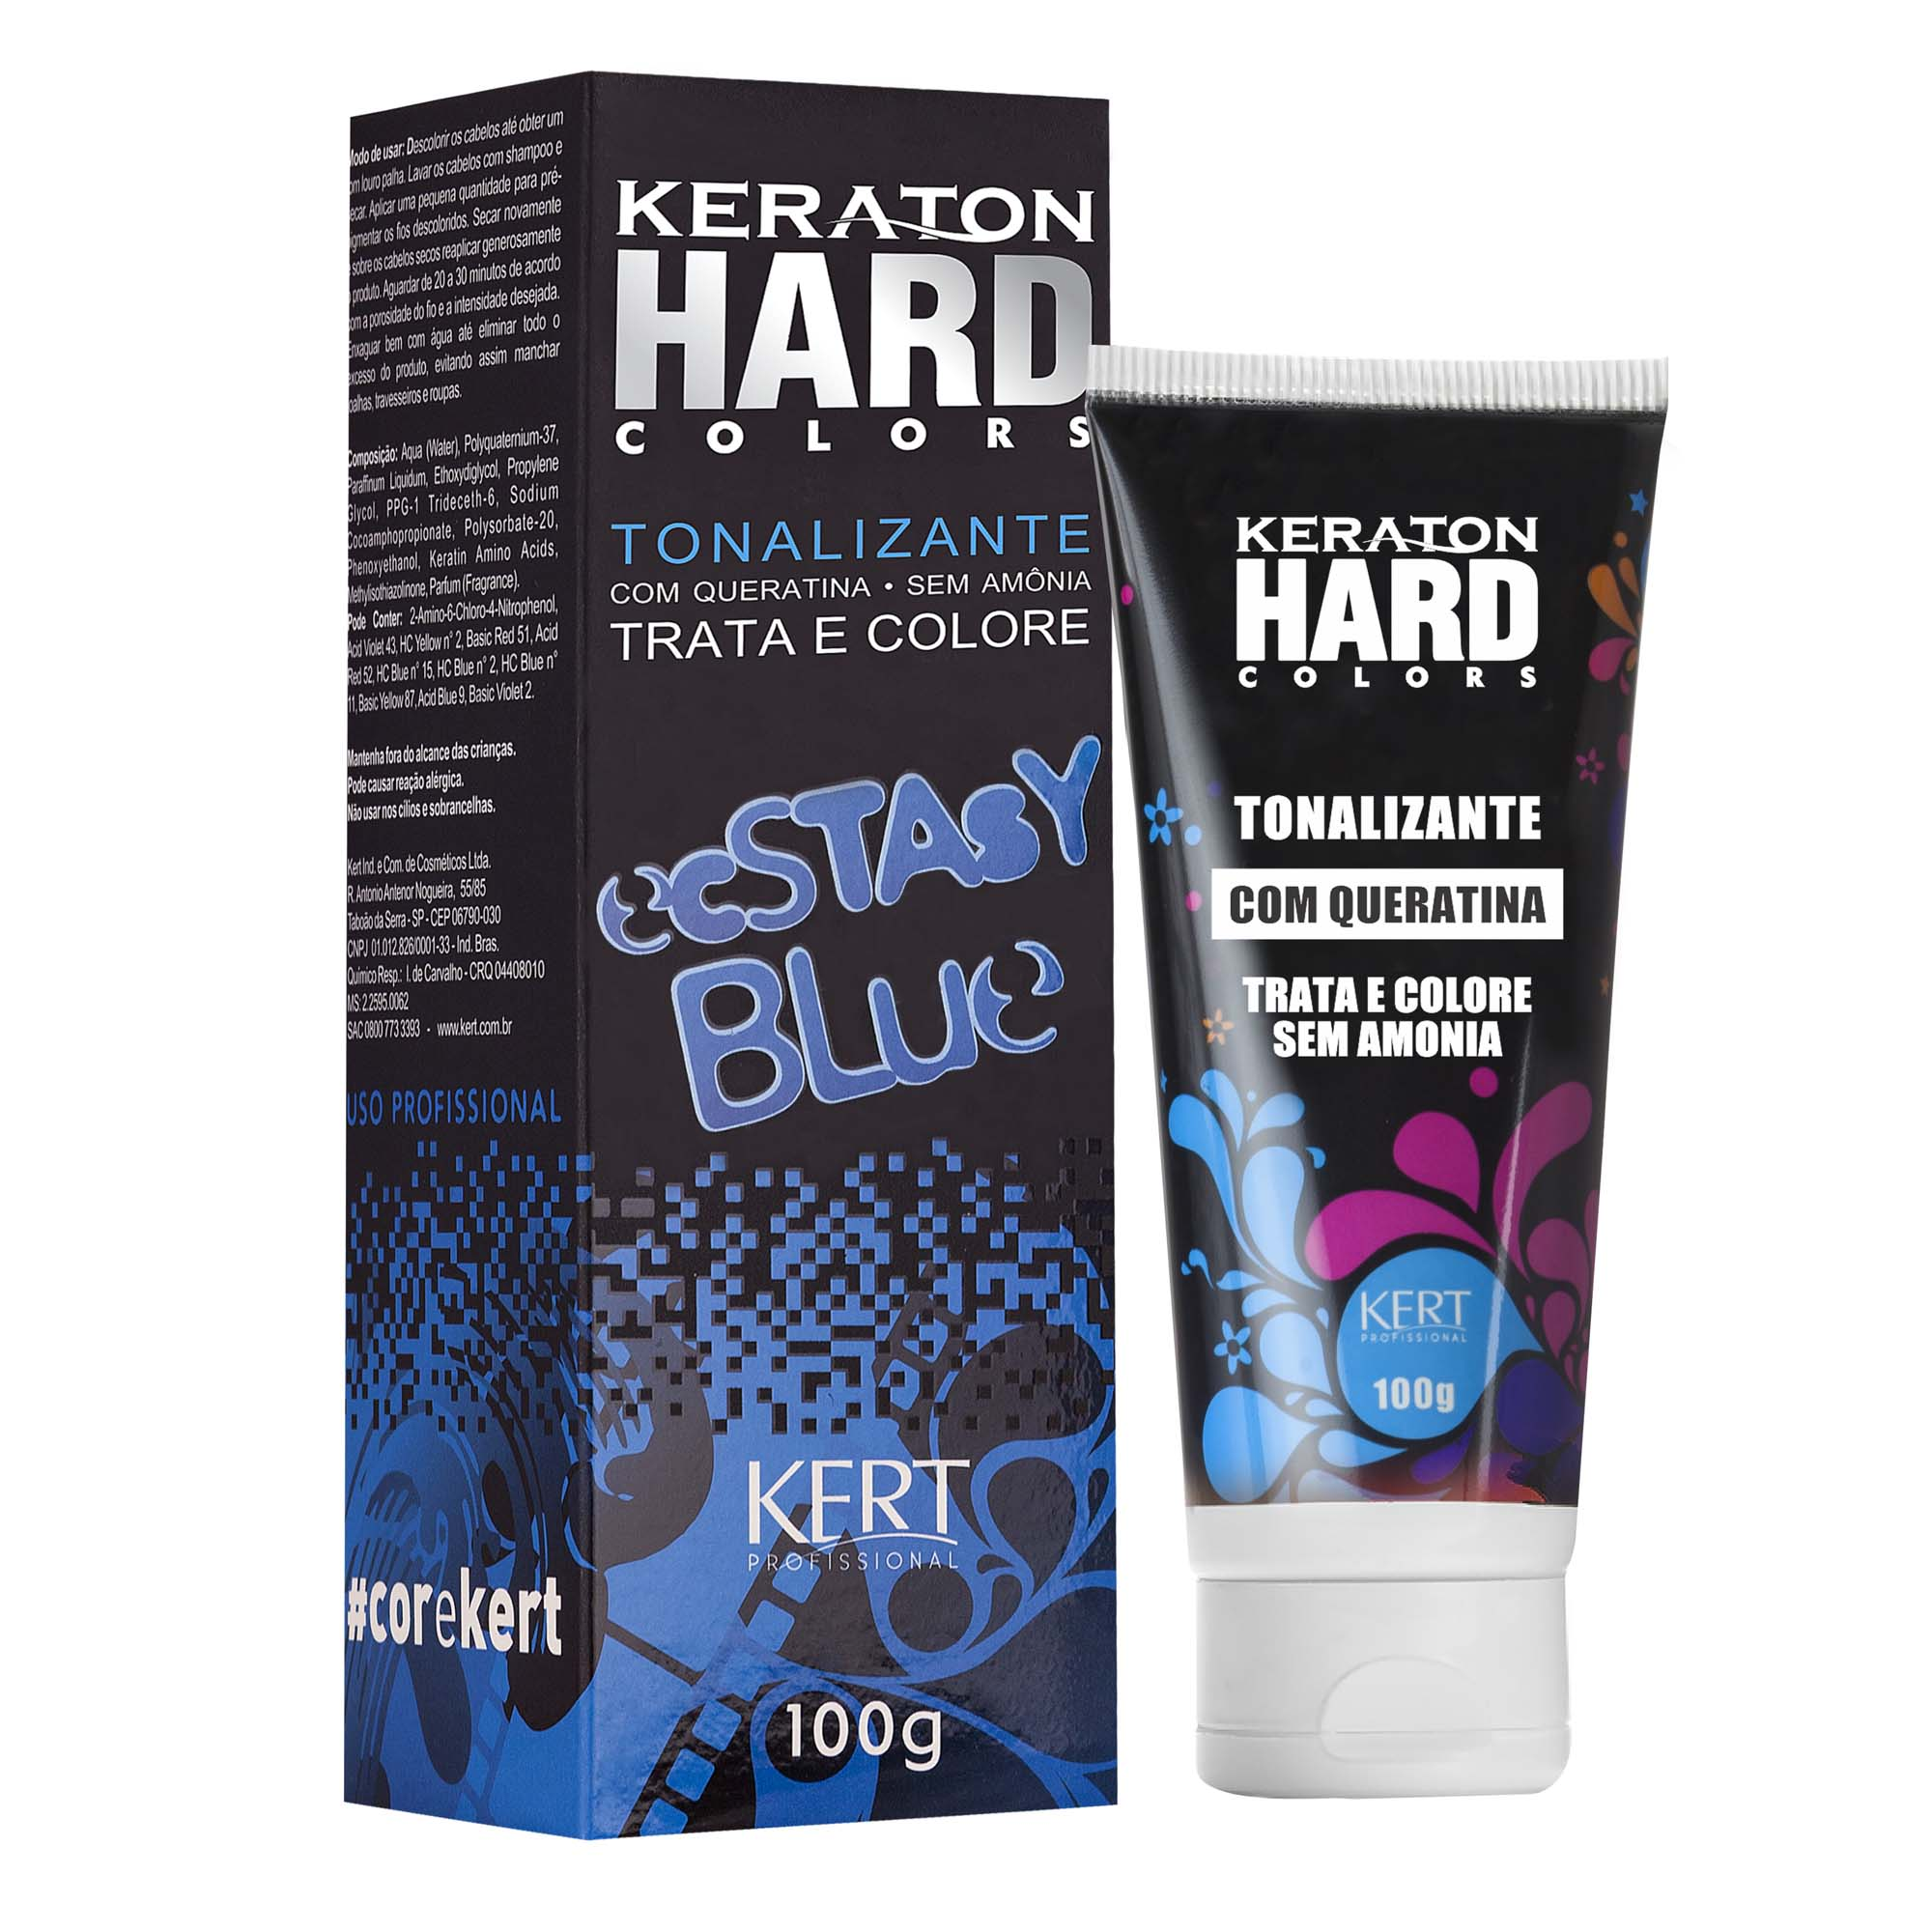 Kert Keraton Hard Colors Tonalizante Cor Ecstasy Blue - 100g